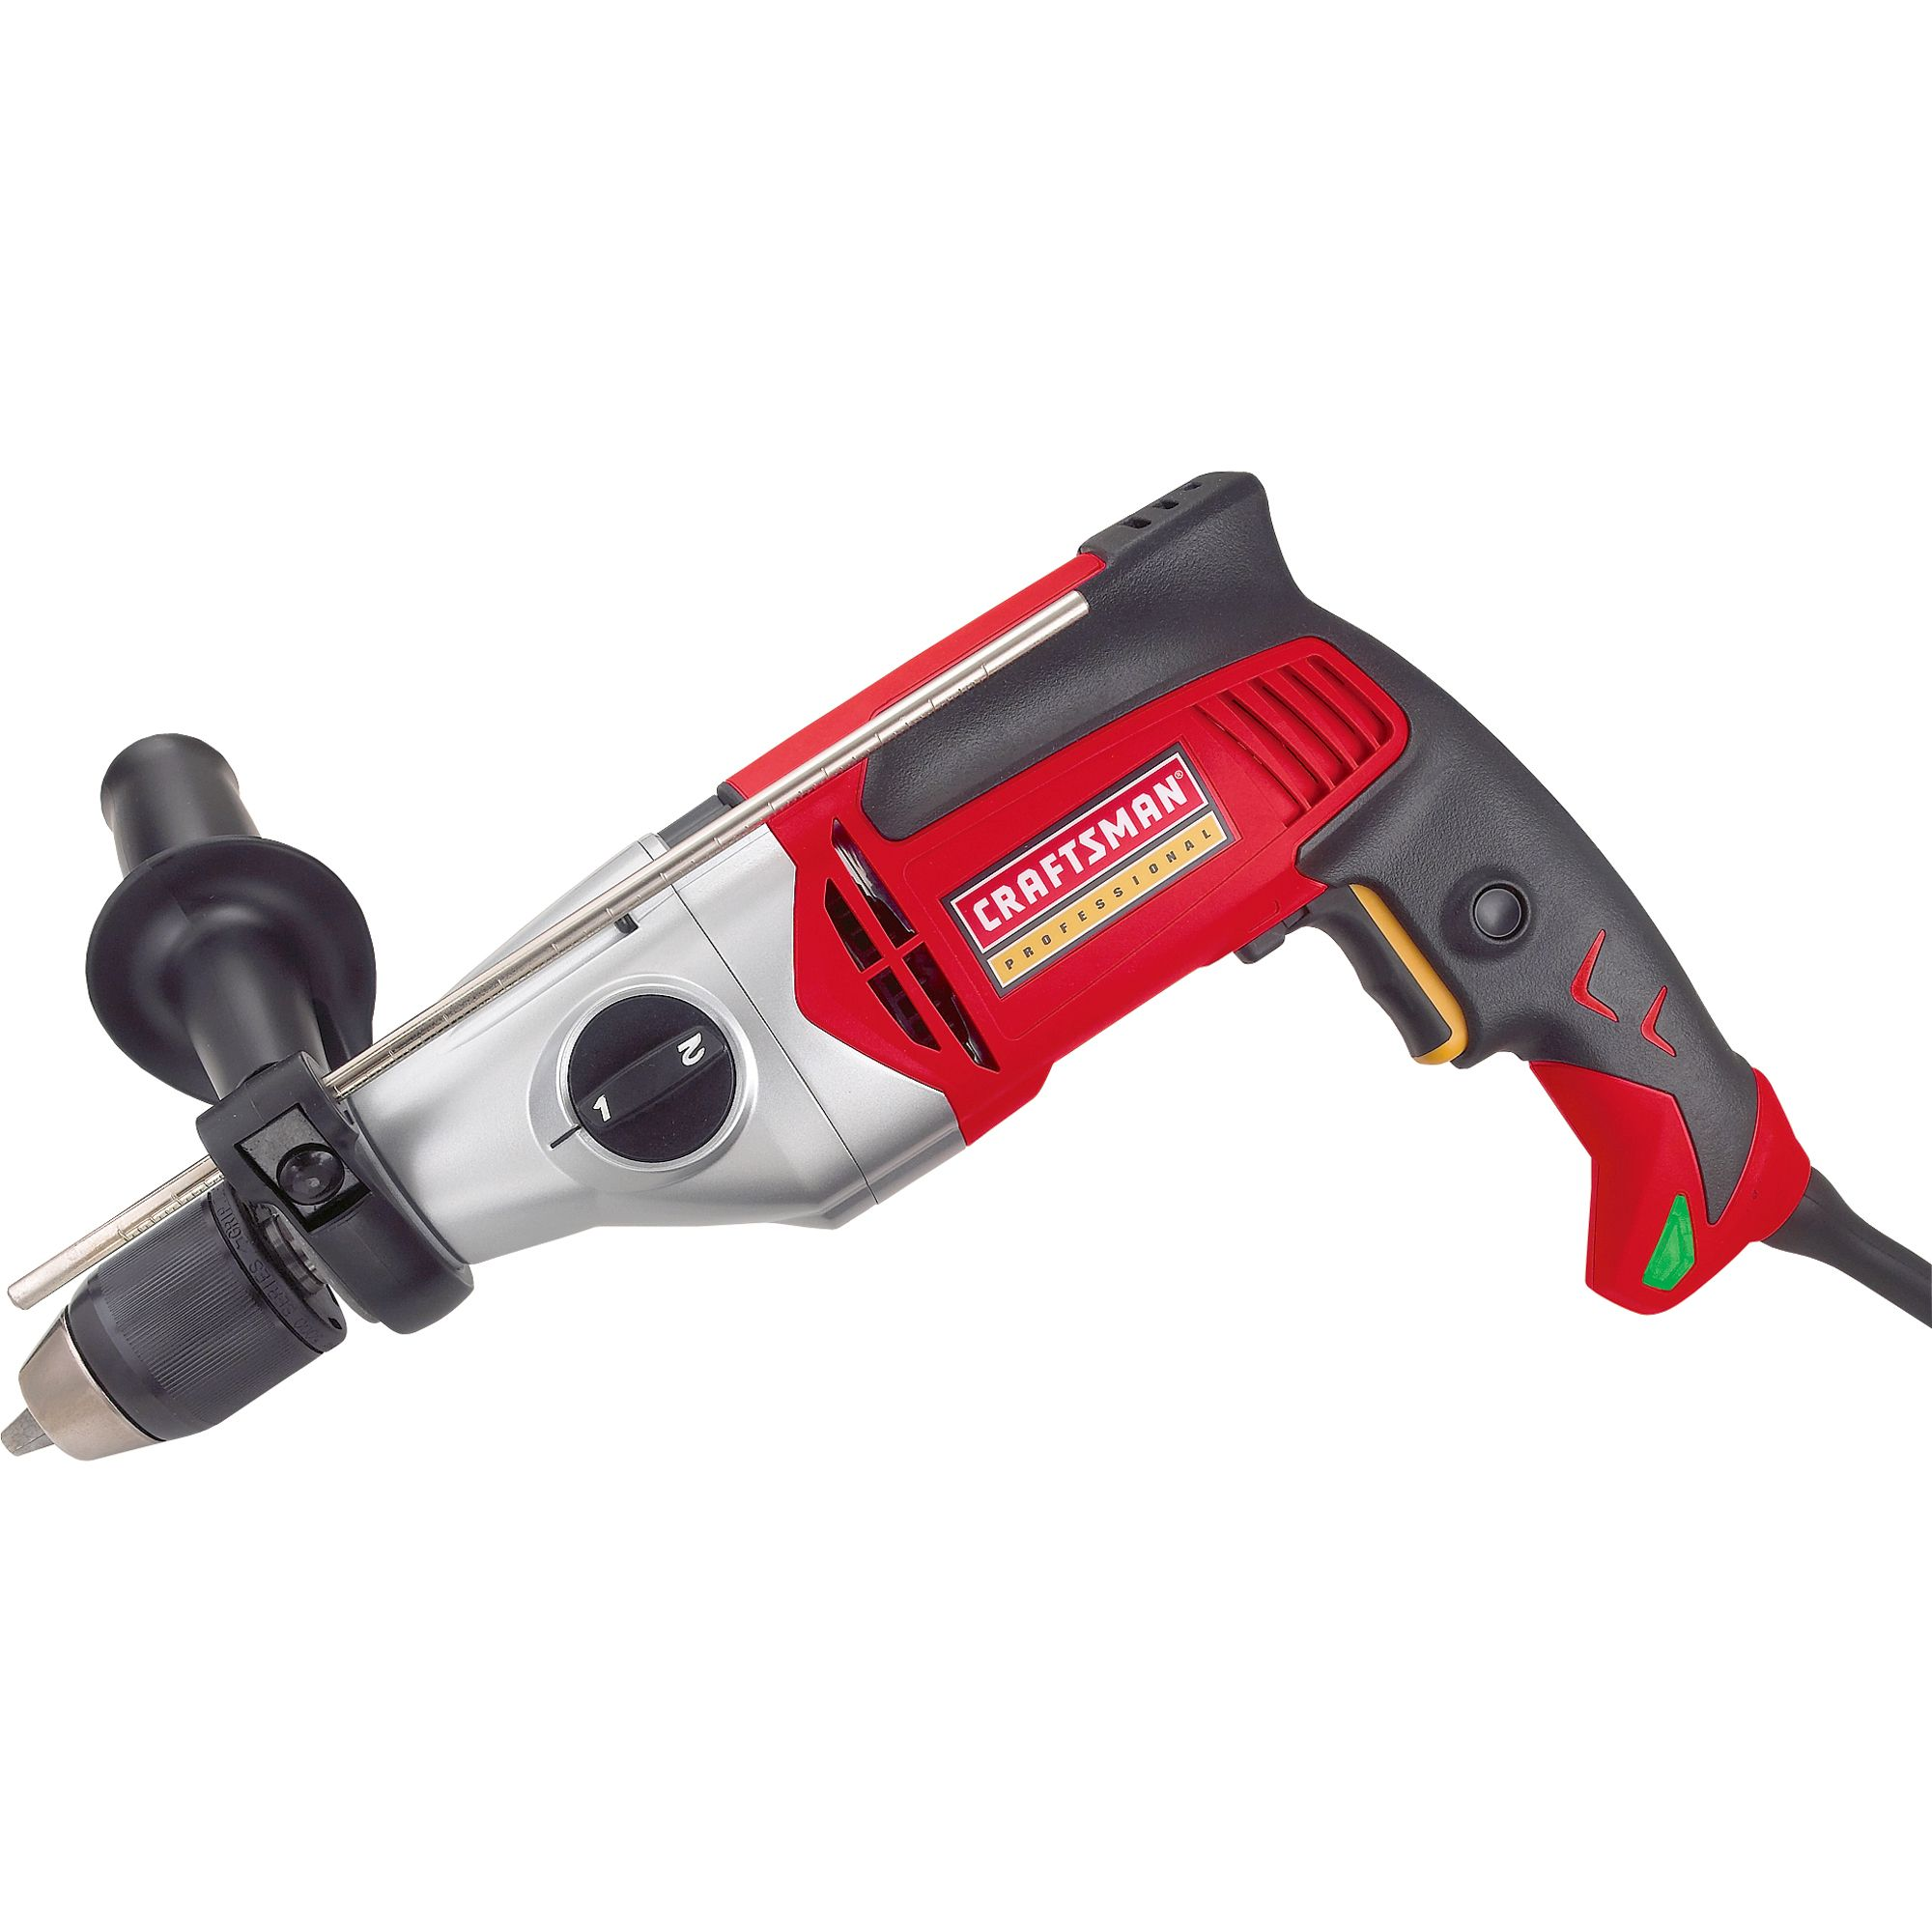 Craftsman Professional - 26567 7.5 Amp Corded 1 2